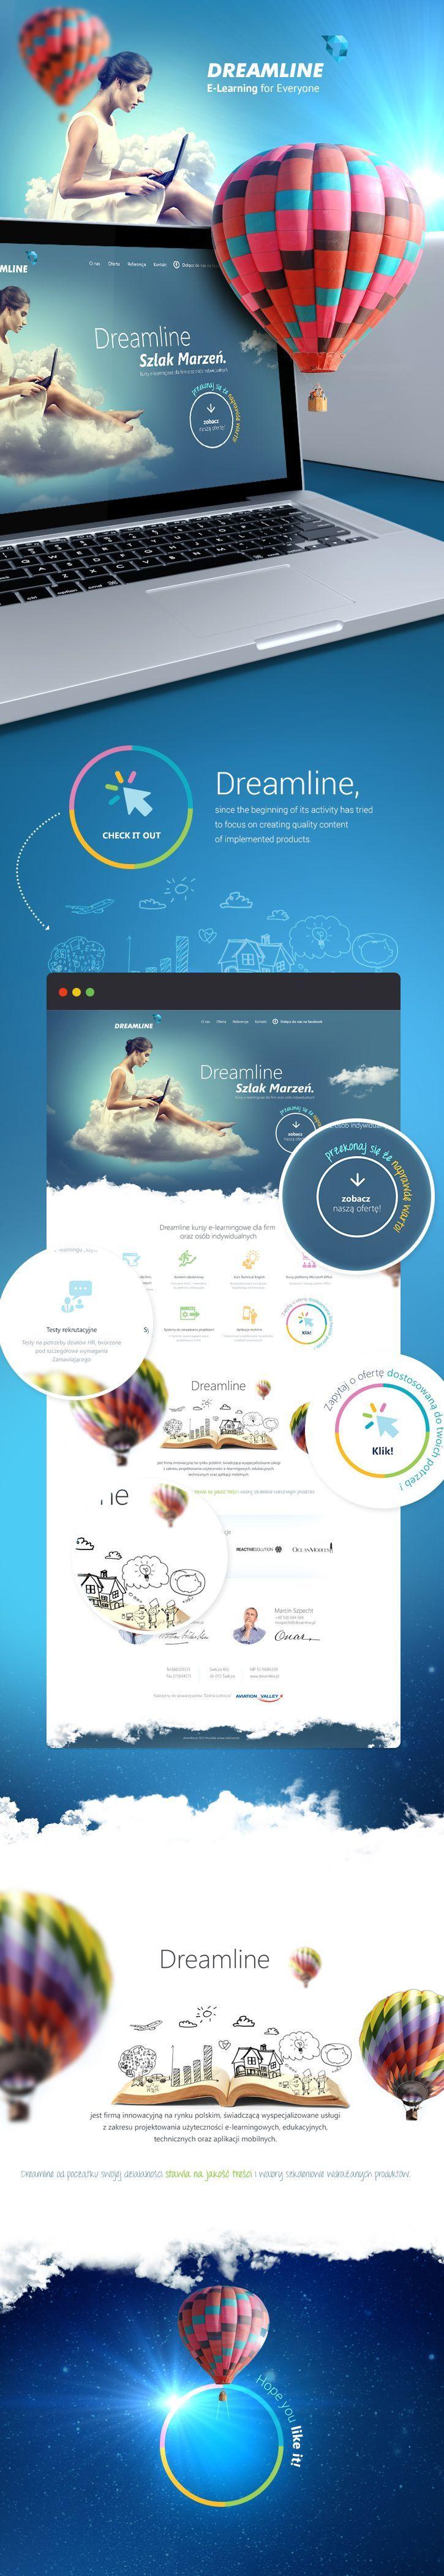 Dreamline Website Design